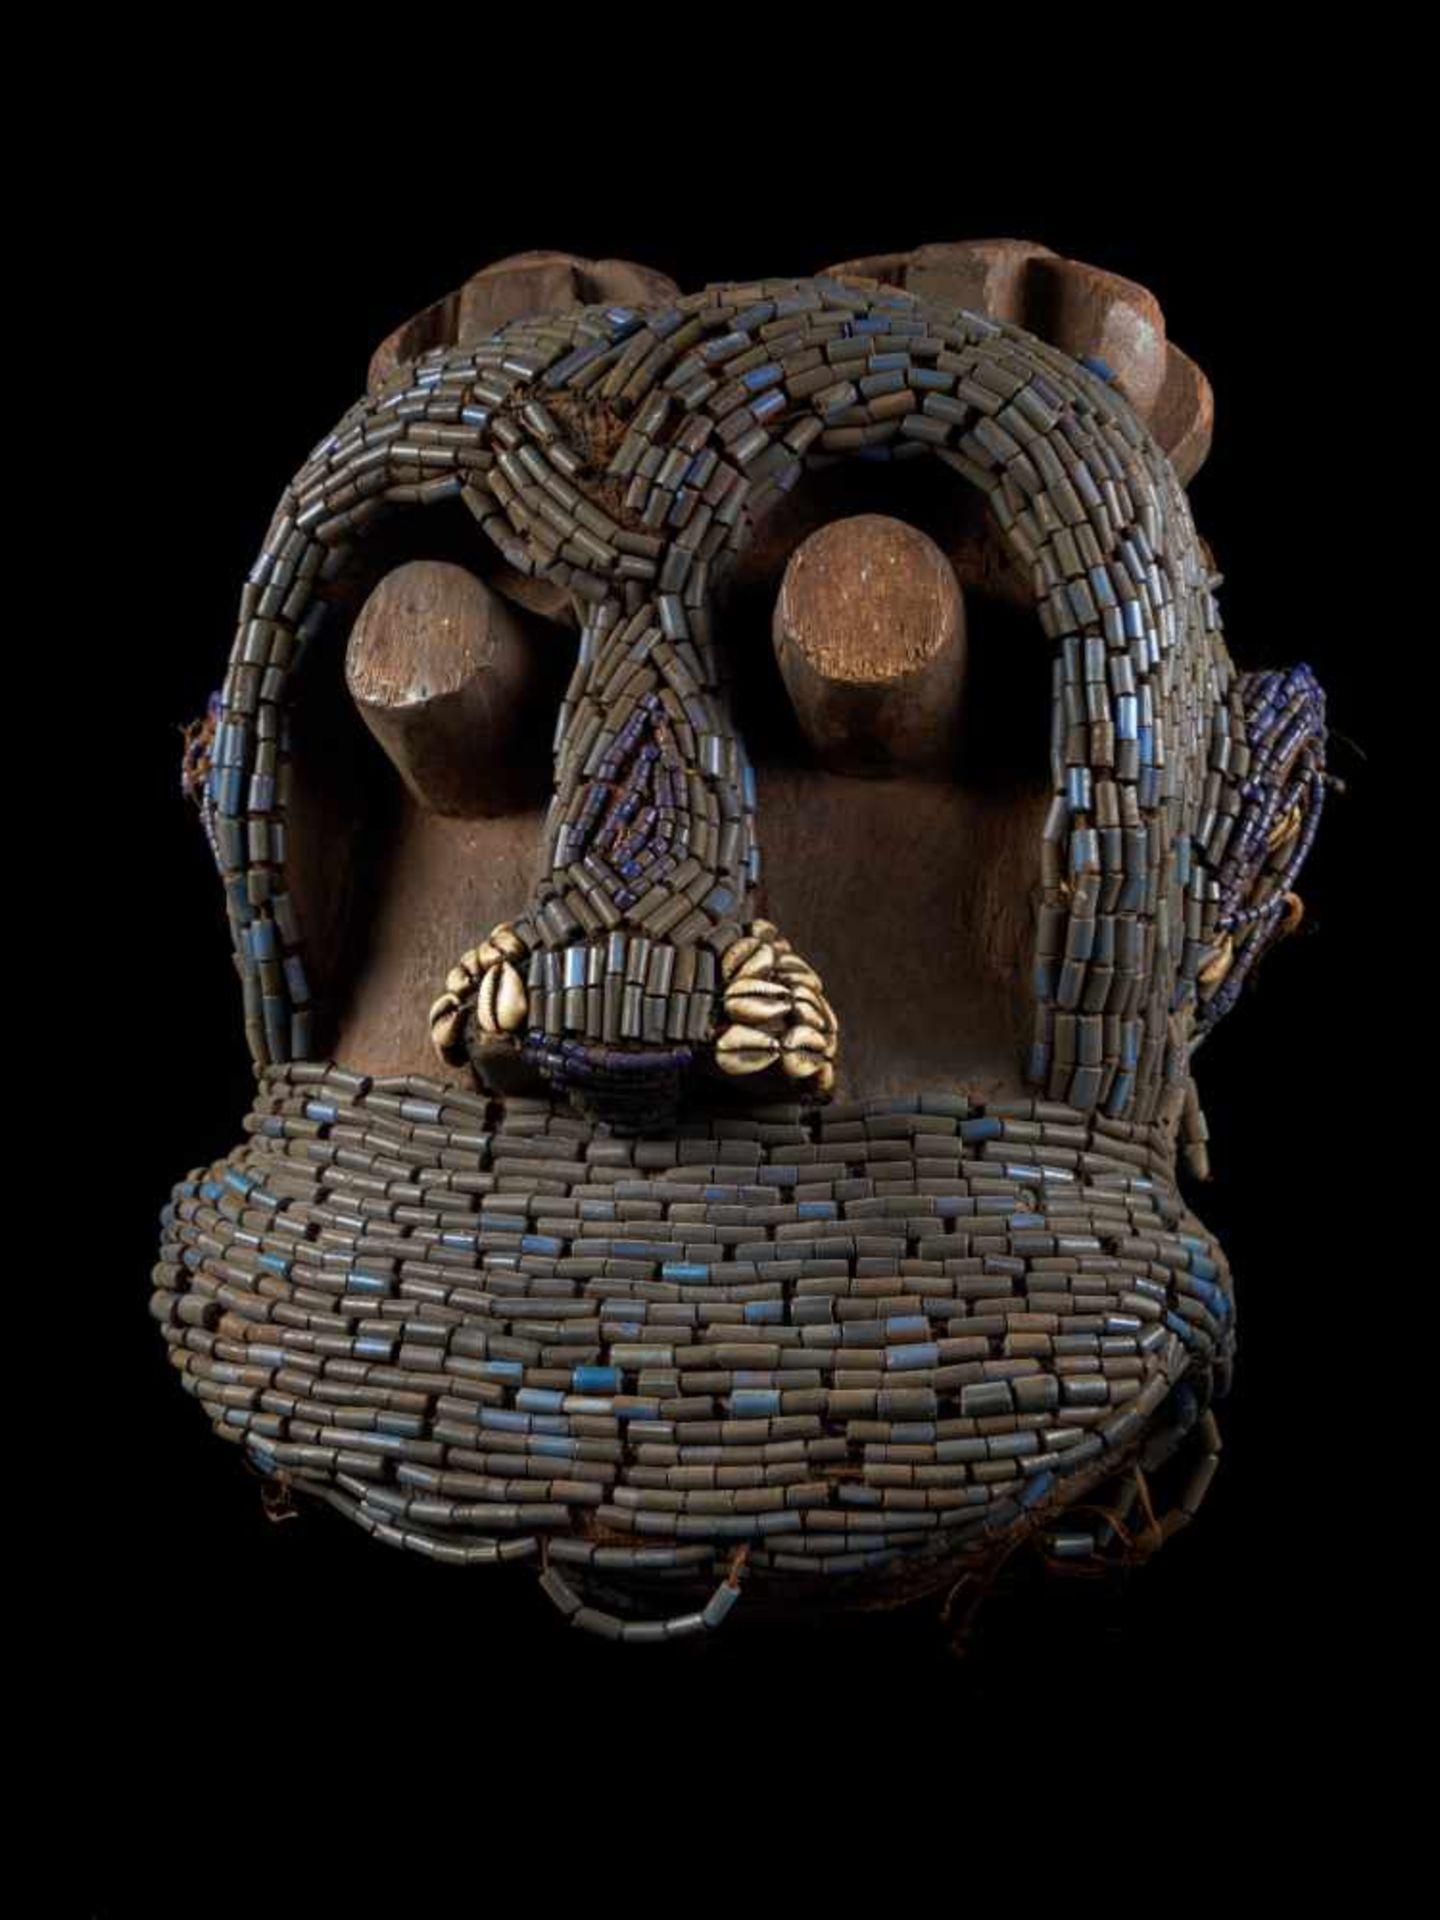 Beaded Gorilla Mask With Wooden Headdress - Tribal ArtA beautiful gorilla mask fashioned from wood - Bild 6 aus 7